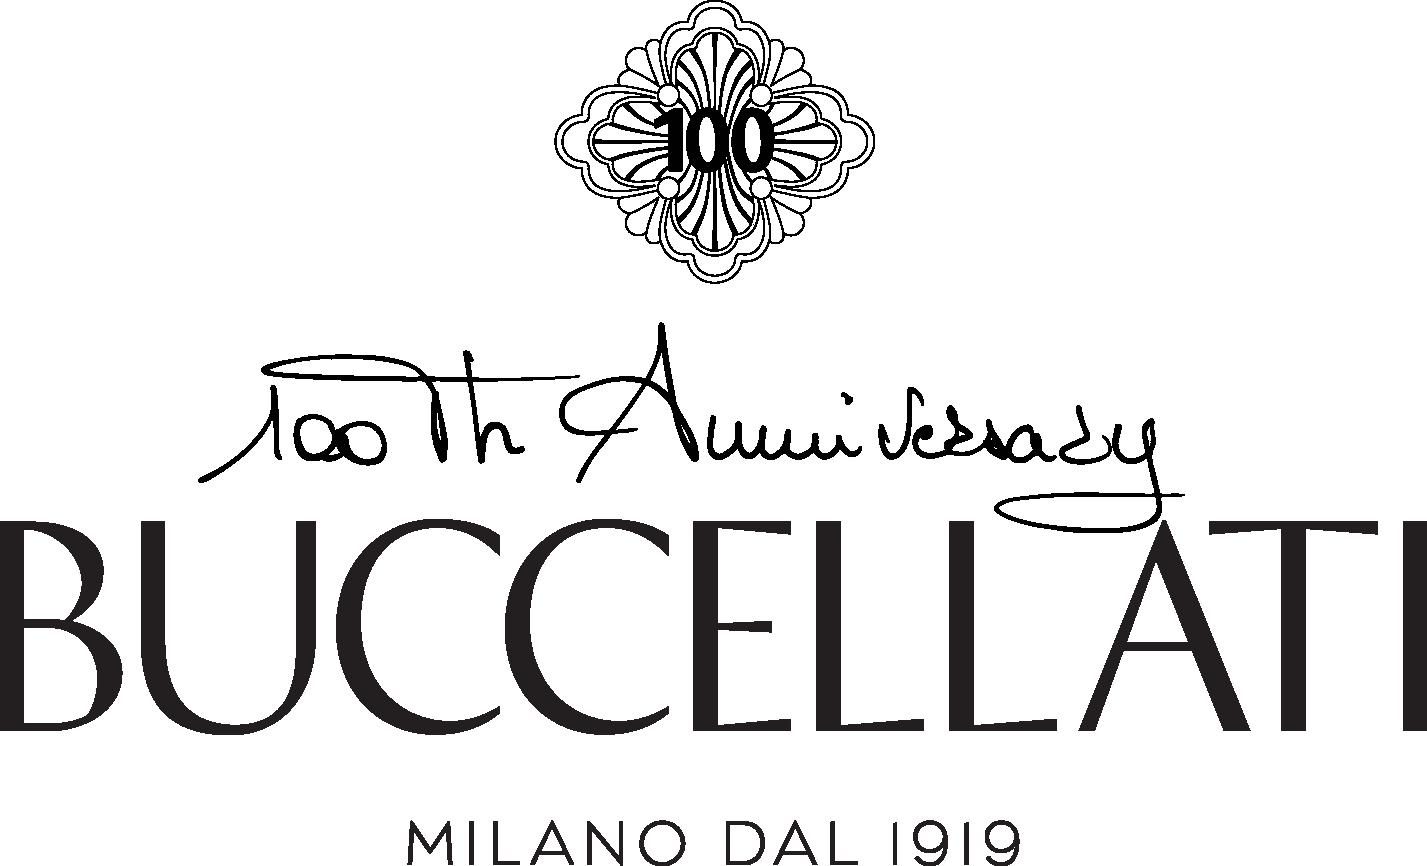 buccellati-centenary-logo.png